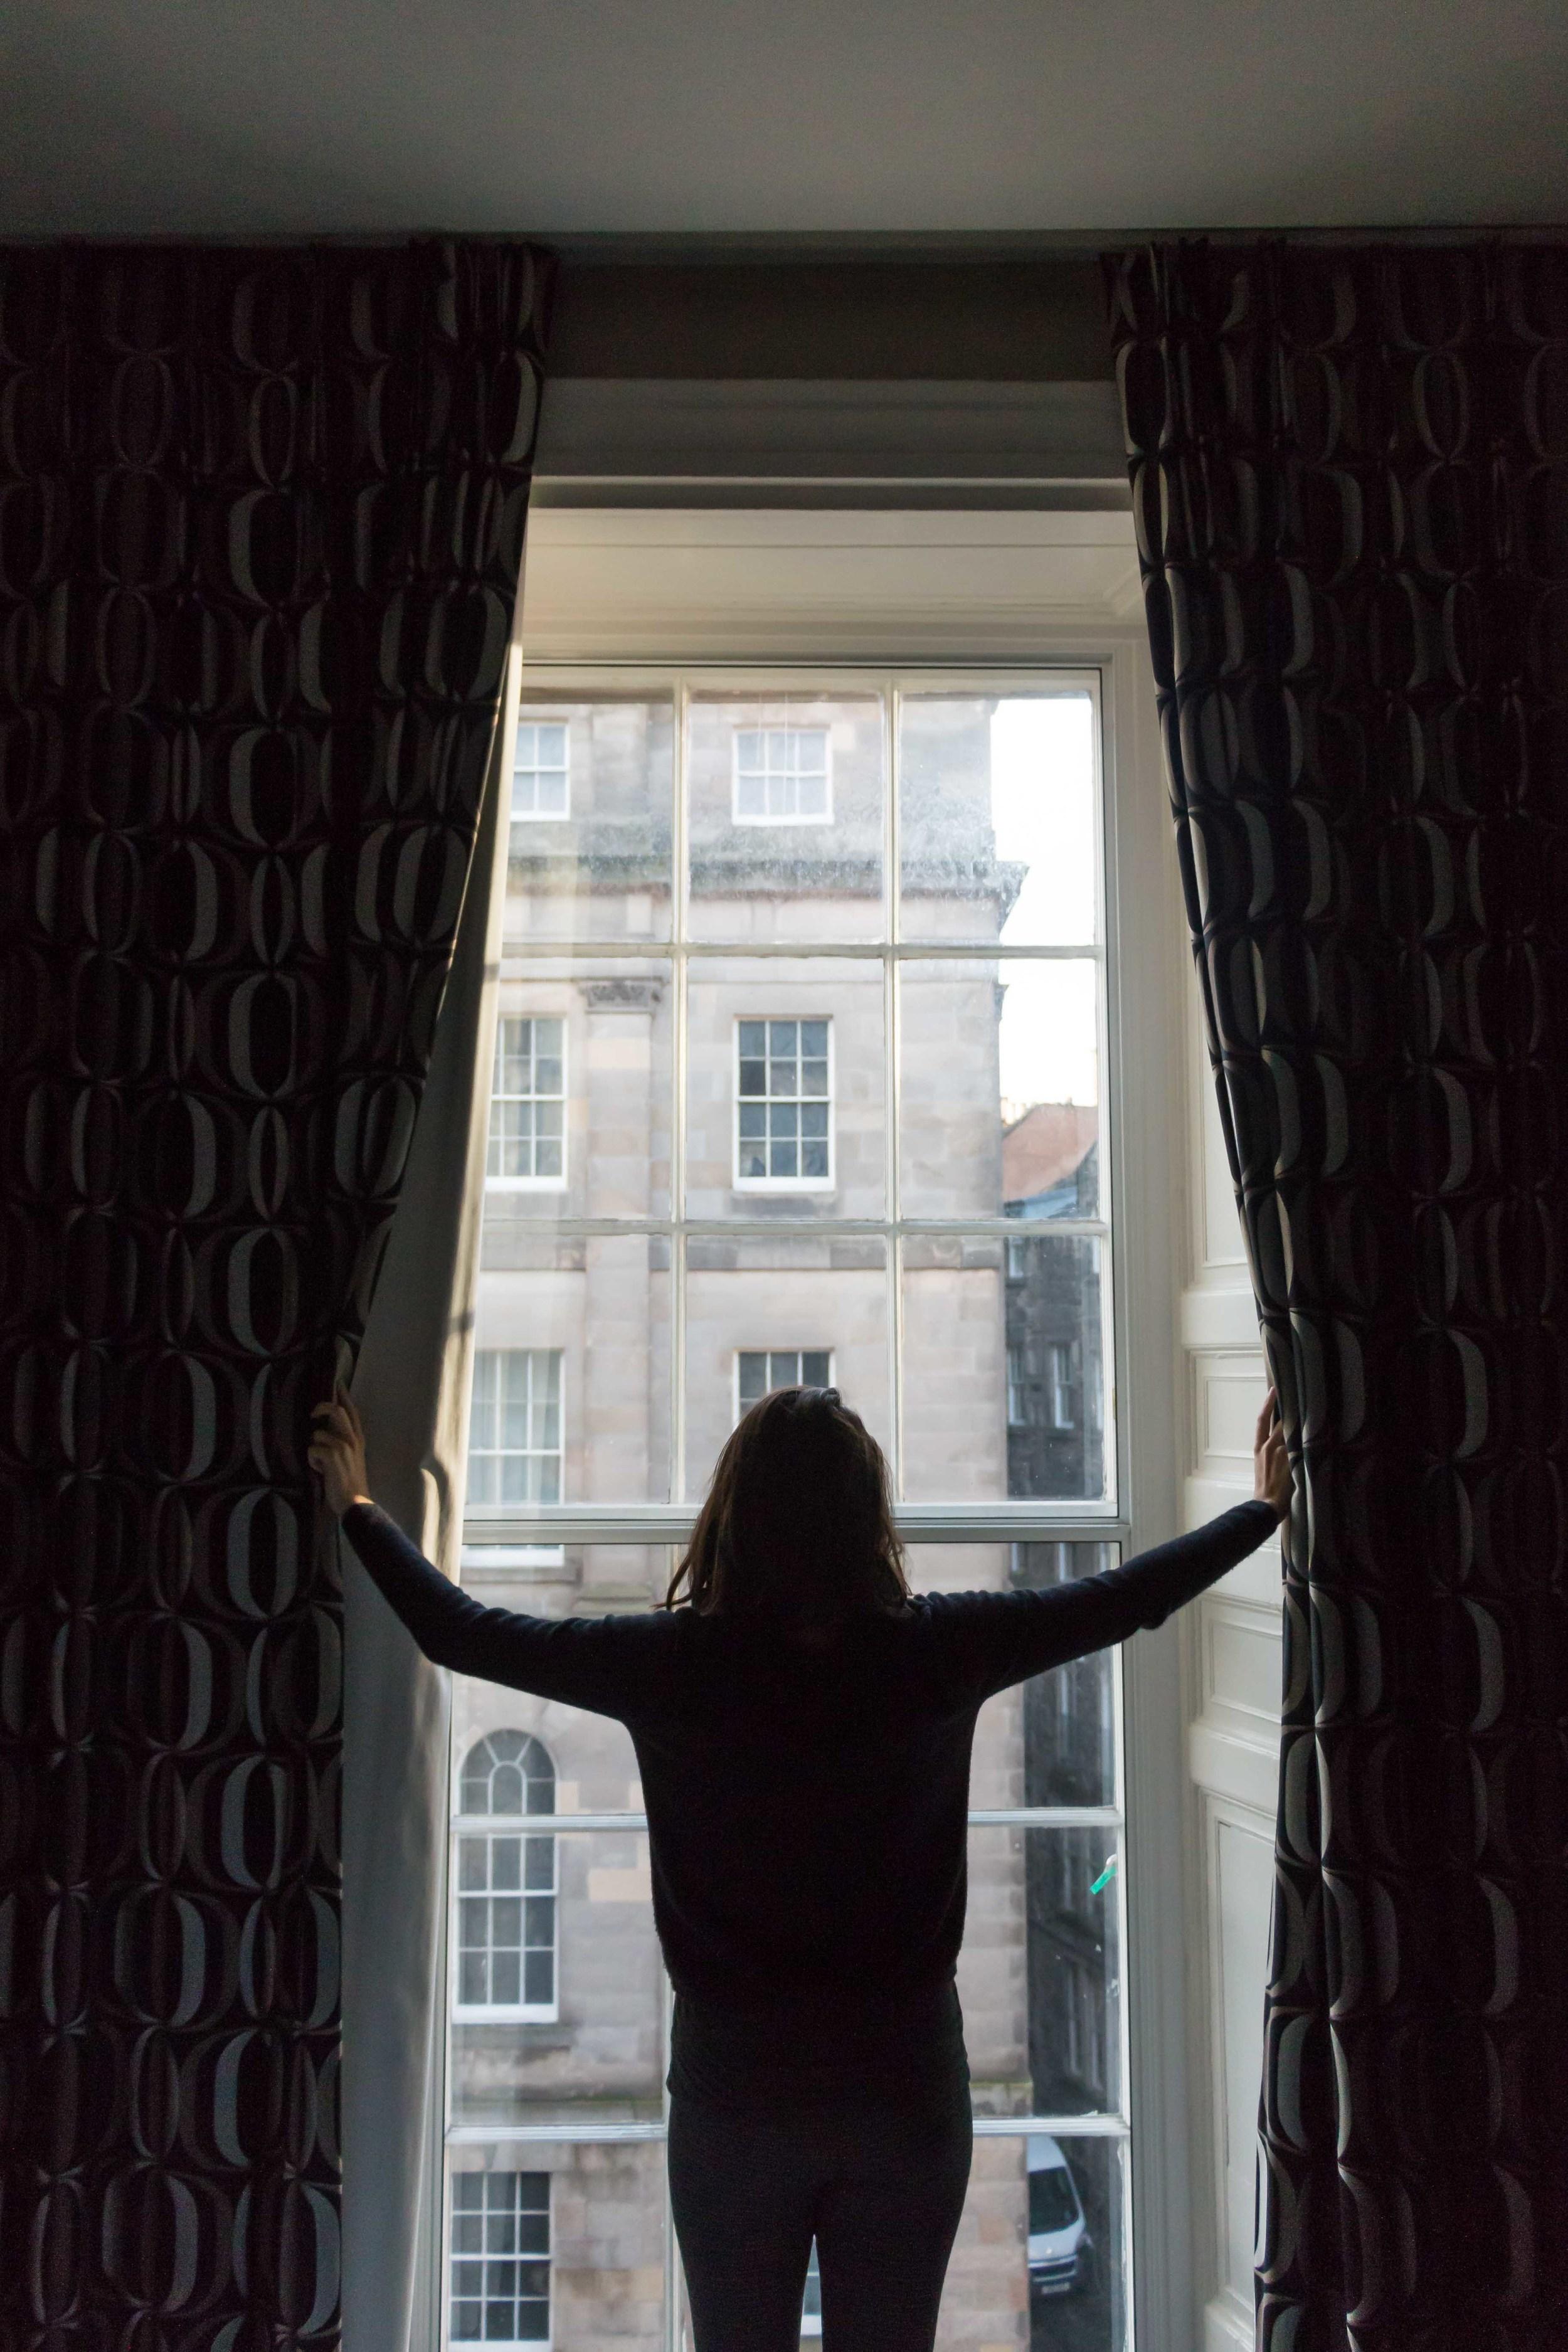 SOA_Edinburgh-Scotland-apex-hotel.jpg